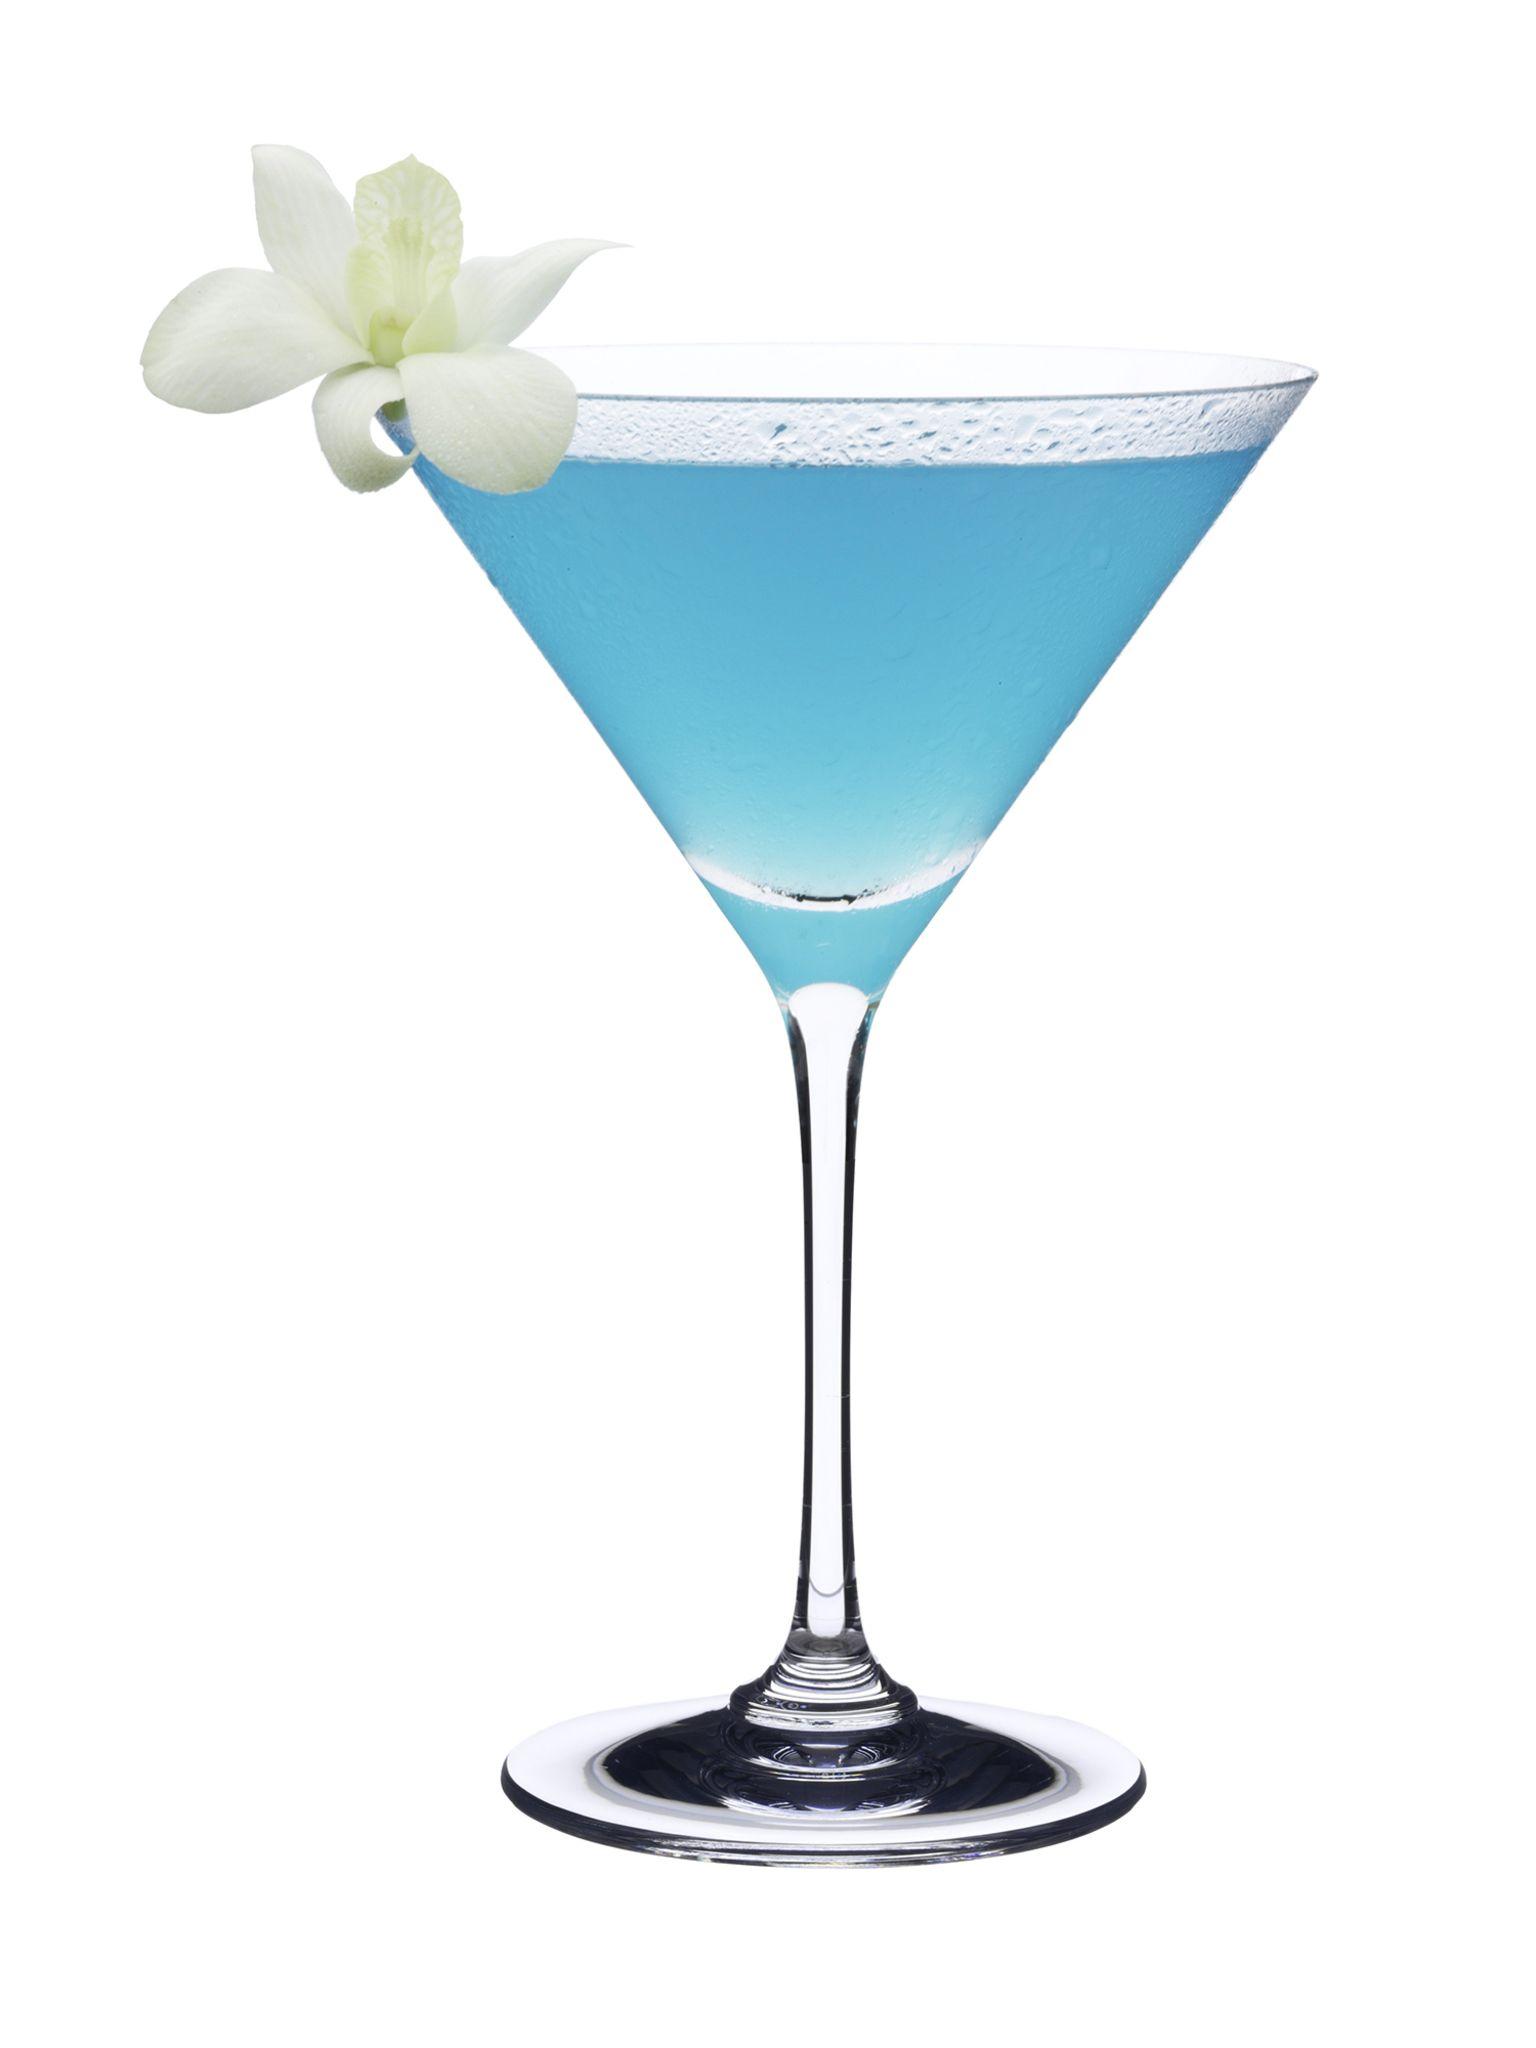 Enjoy An Easy Electric Blue Margarita Recipe Fruity Margarita Recipe Blue Margarita Recipe Blue Margarita